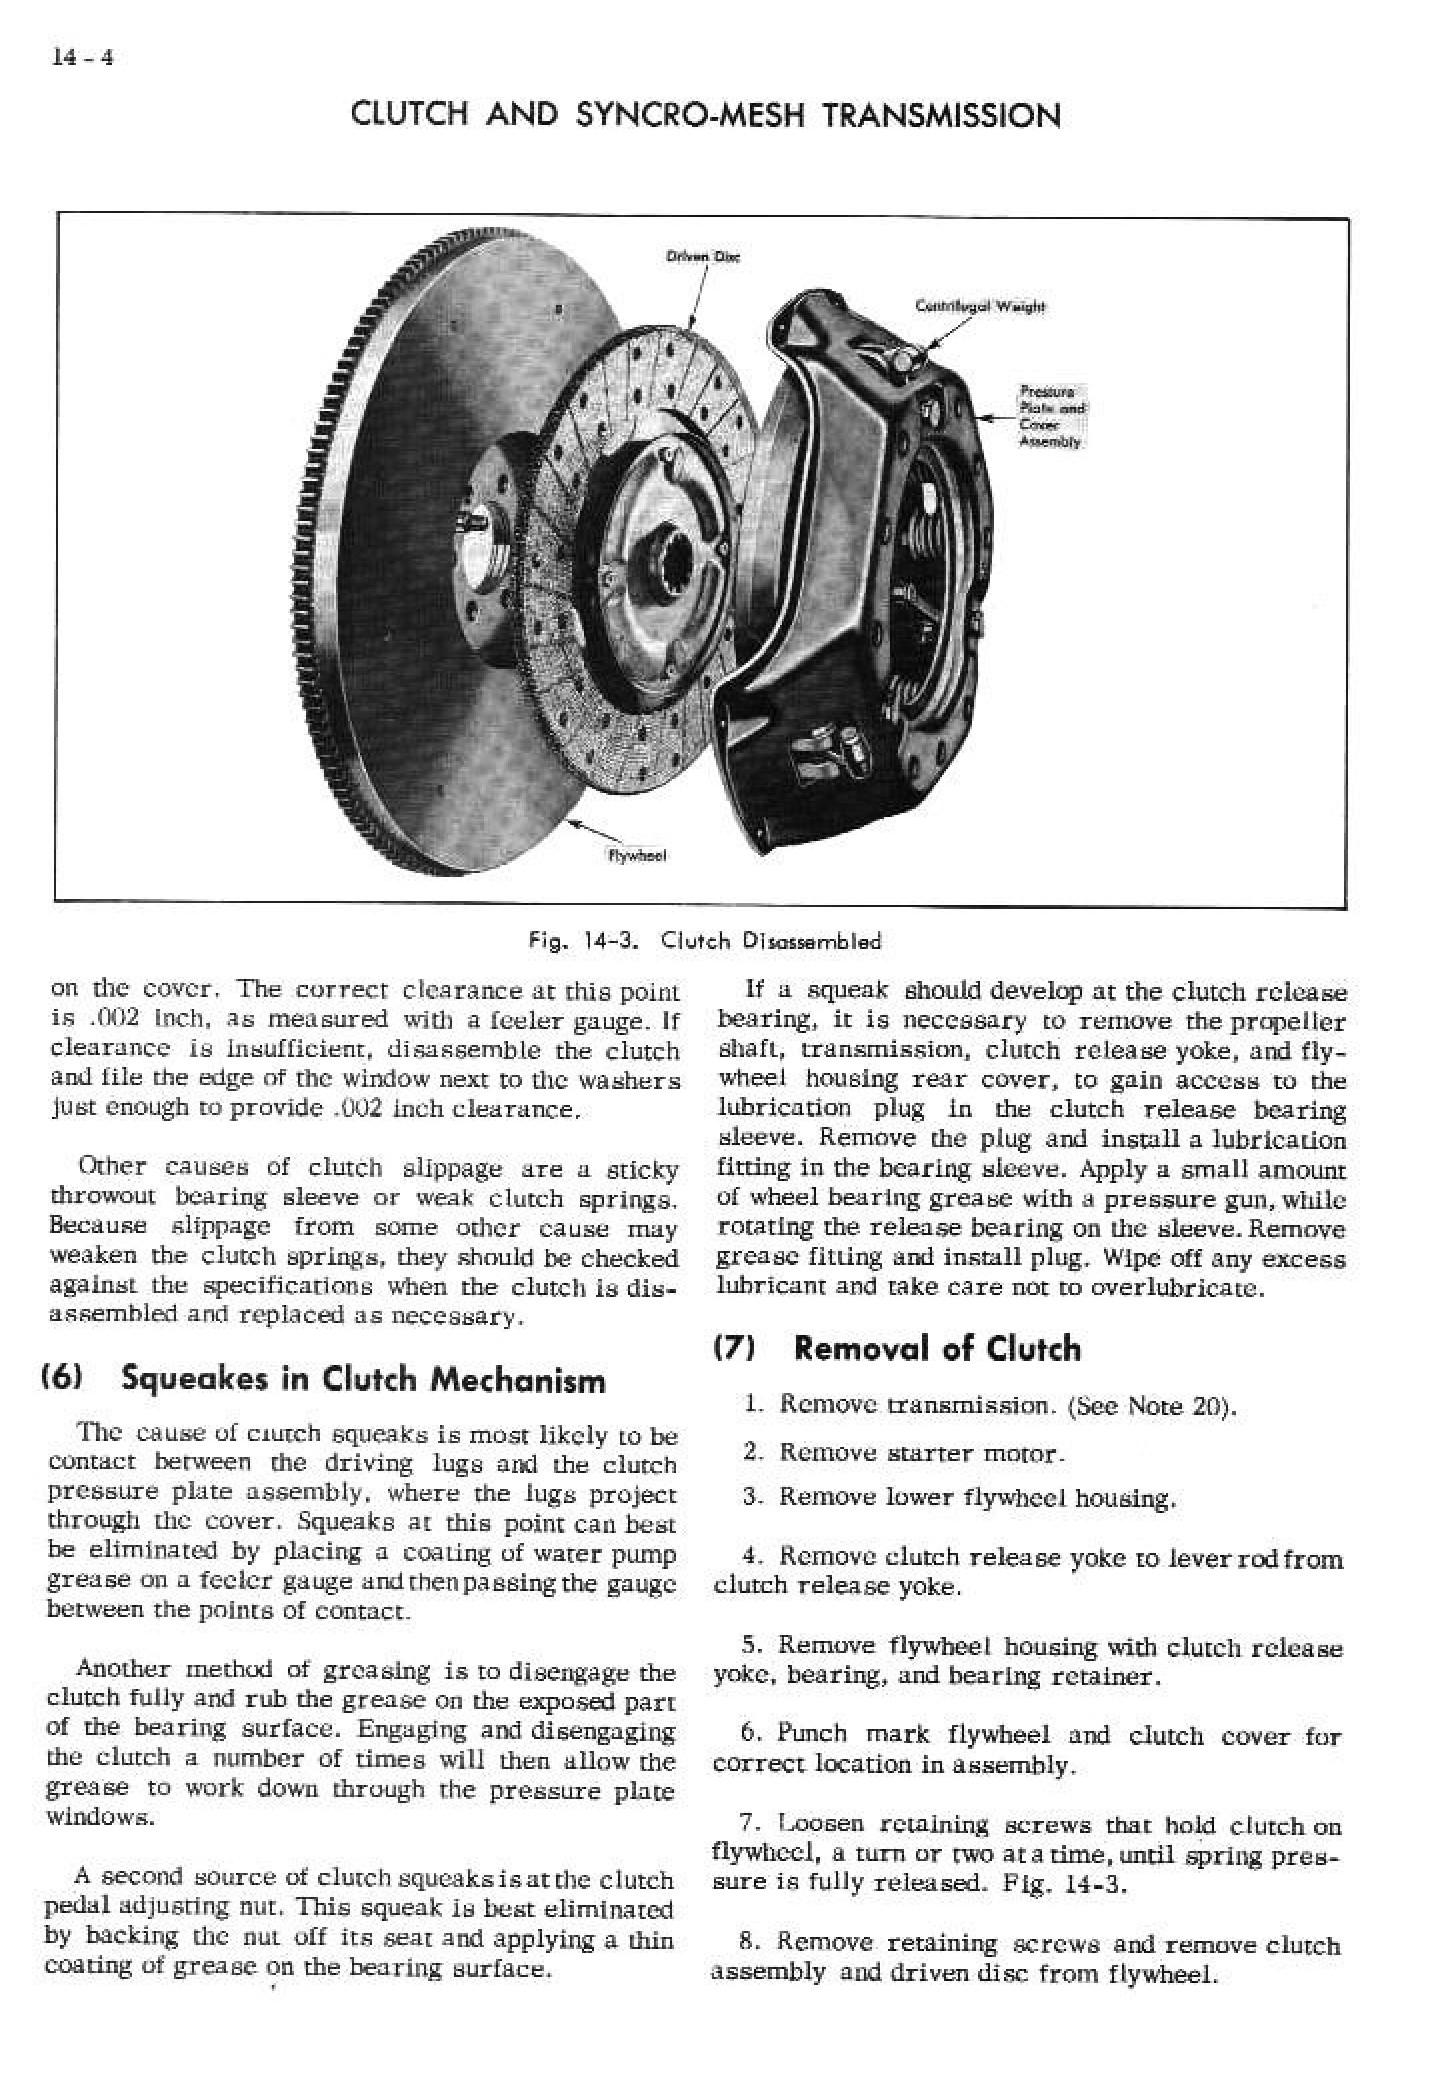 1952 Cadillac Shop Manual- Manual Transmission Page 4 of 13